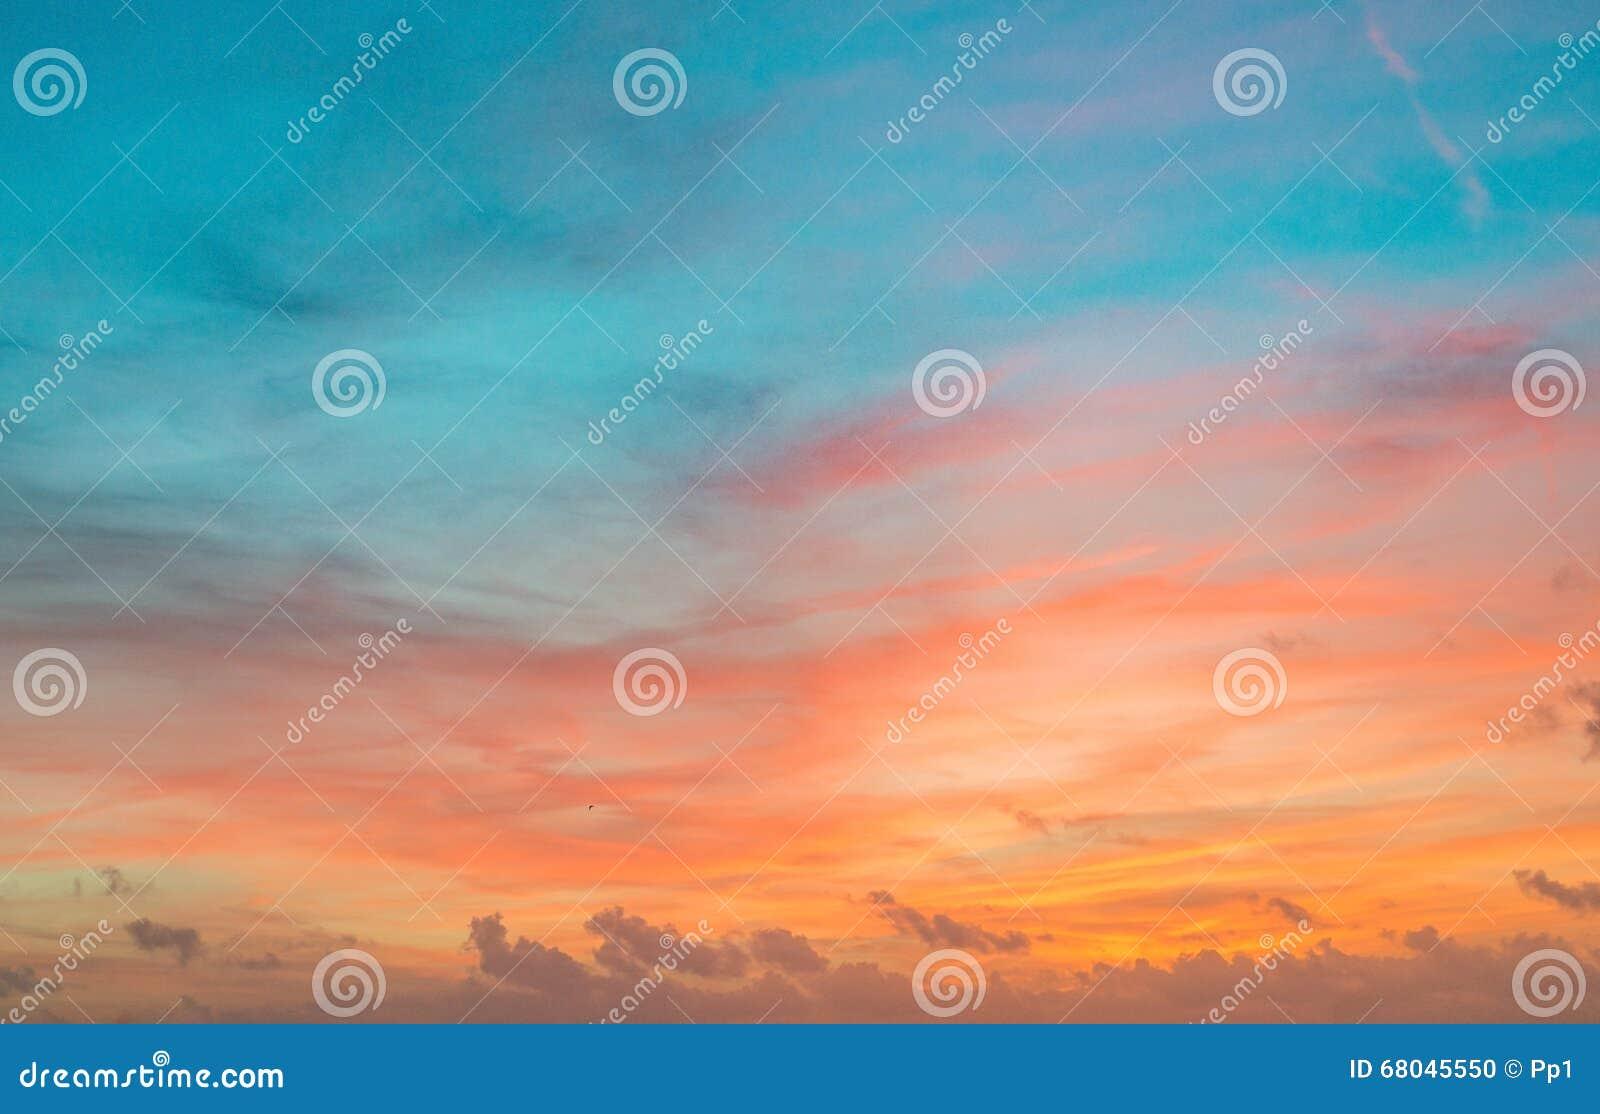 Небо захода солнца в красном и голубом цвете с тонкими облаками